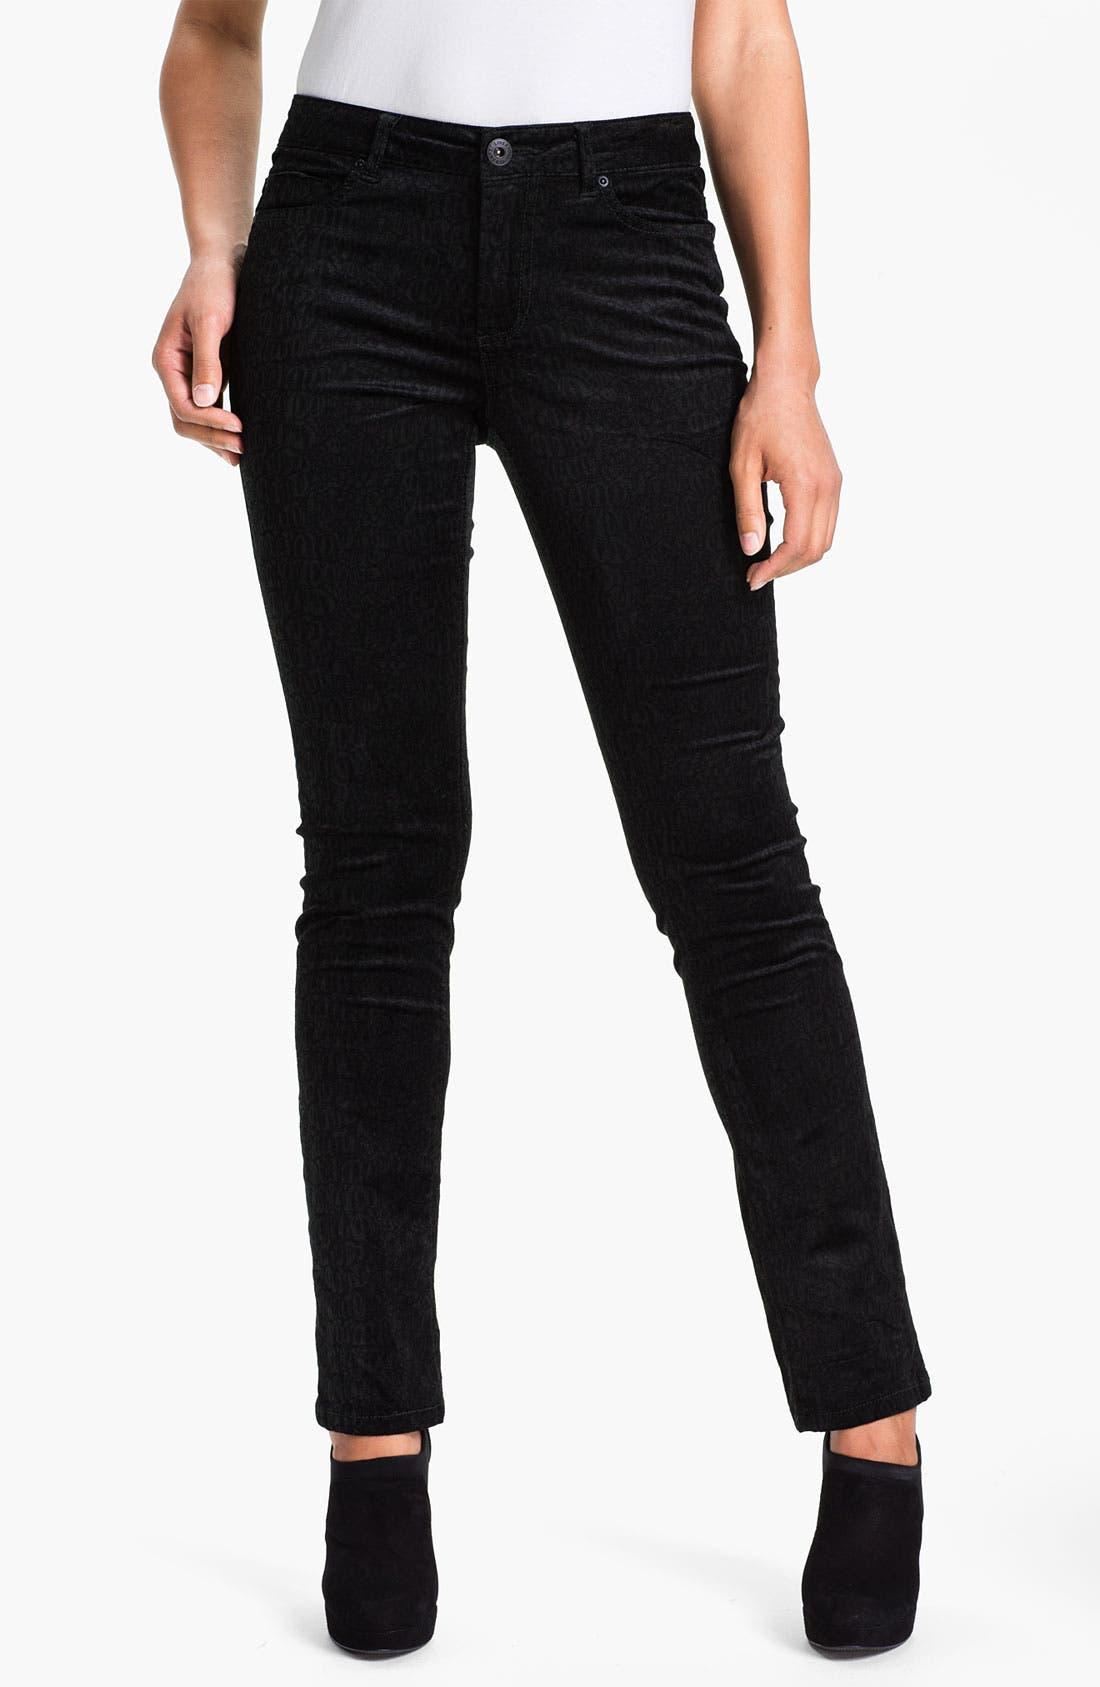 Jeans Company 'Sadie' - Cheetah' Straight Leg Velveteen Jeans,                             Main thumbnail 1, color,                             001